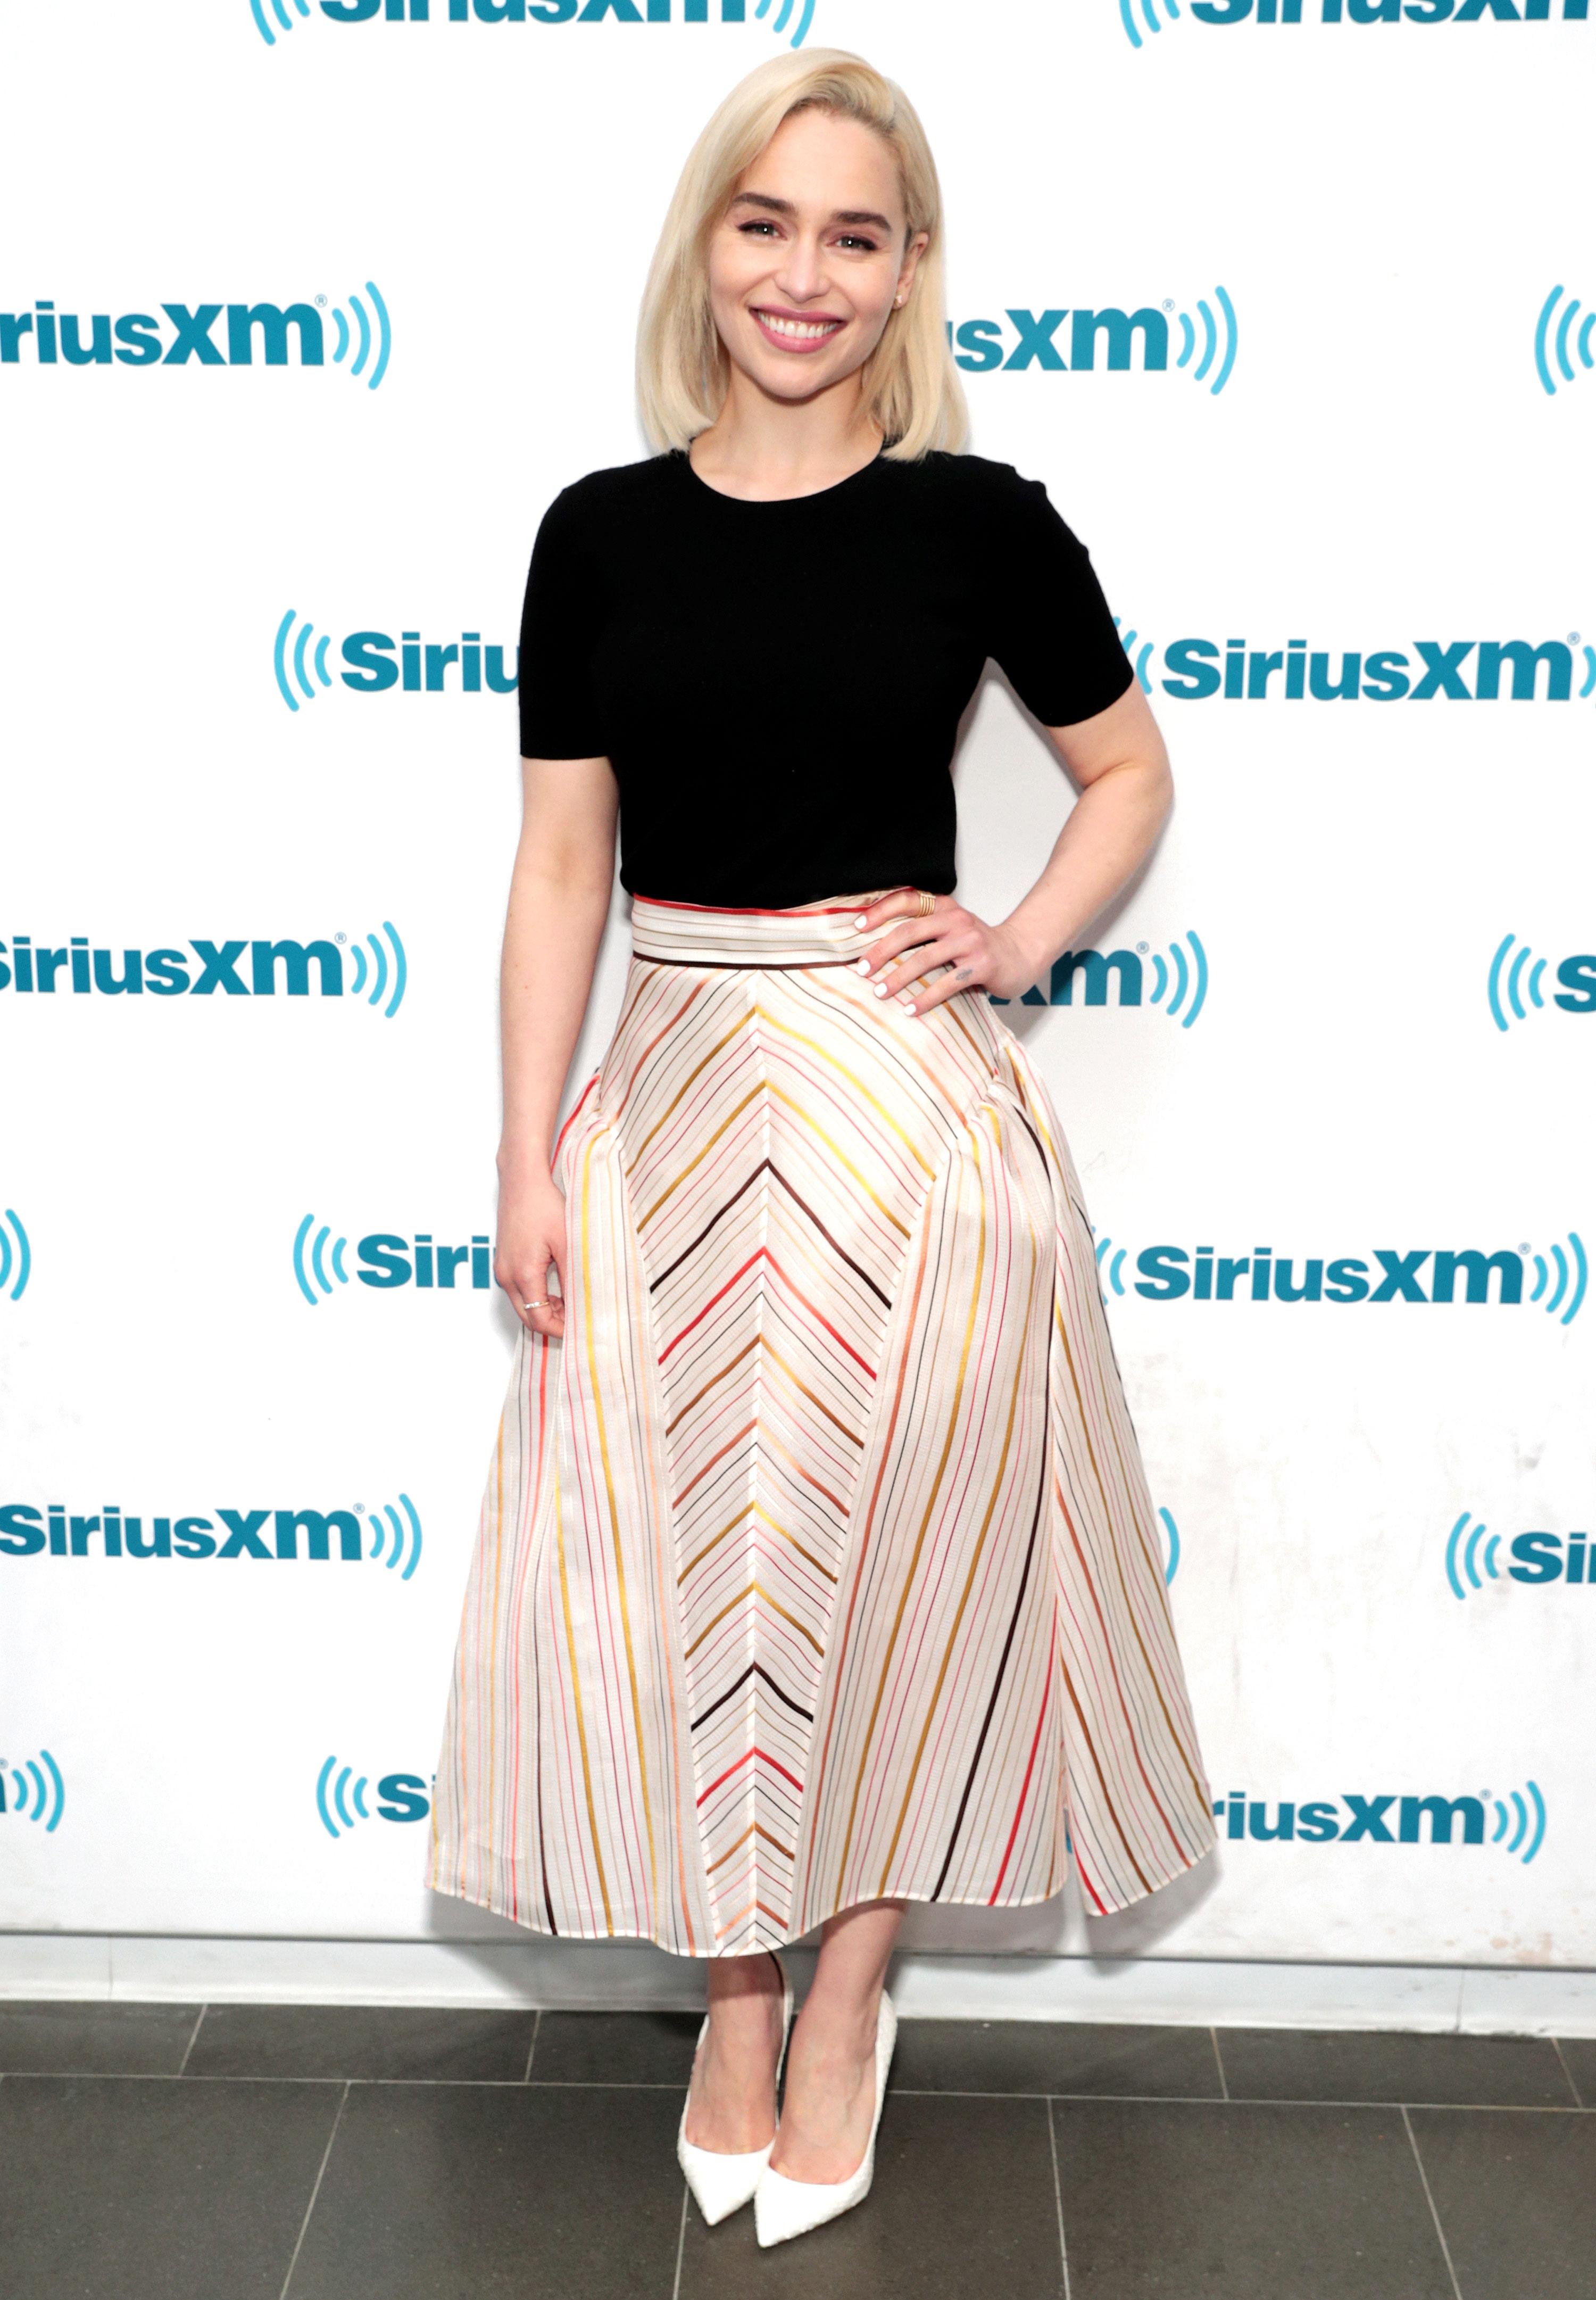 a35b3614fc Emilia Clarke s Best Dresses and Outfits  Pics